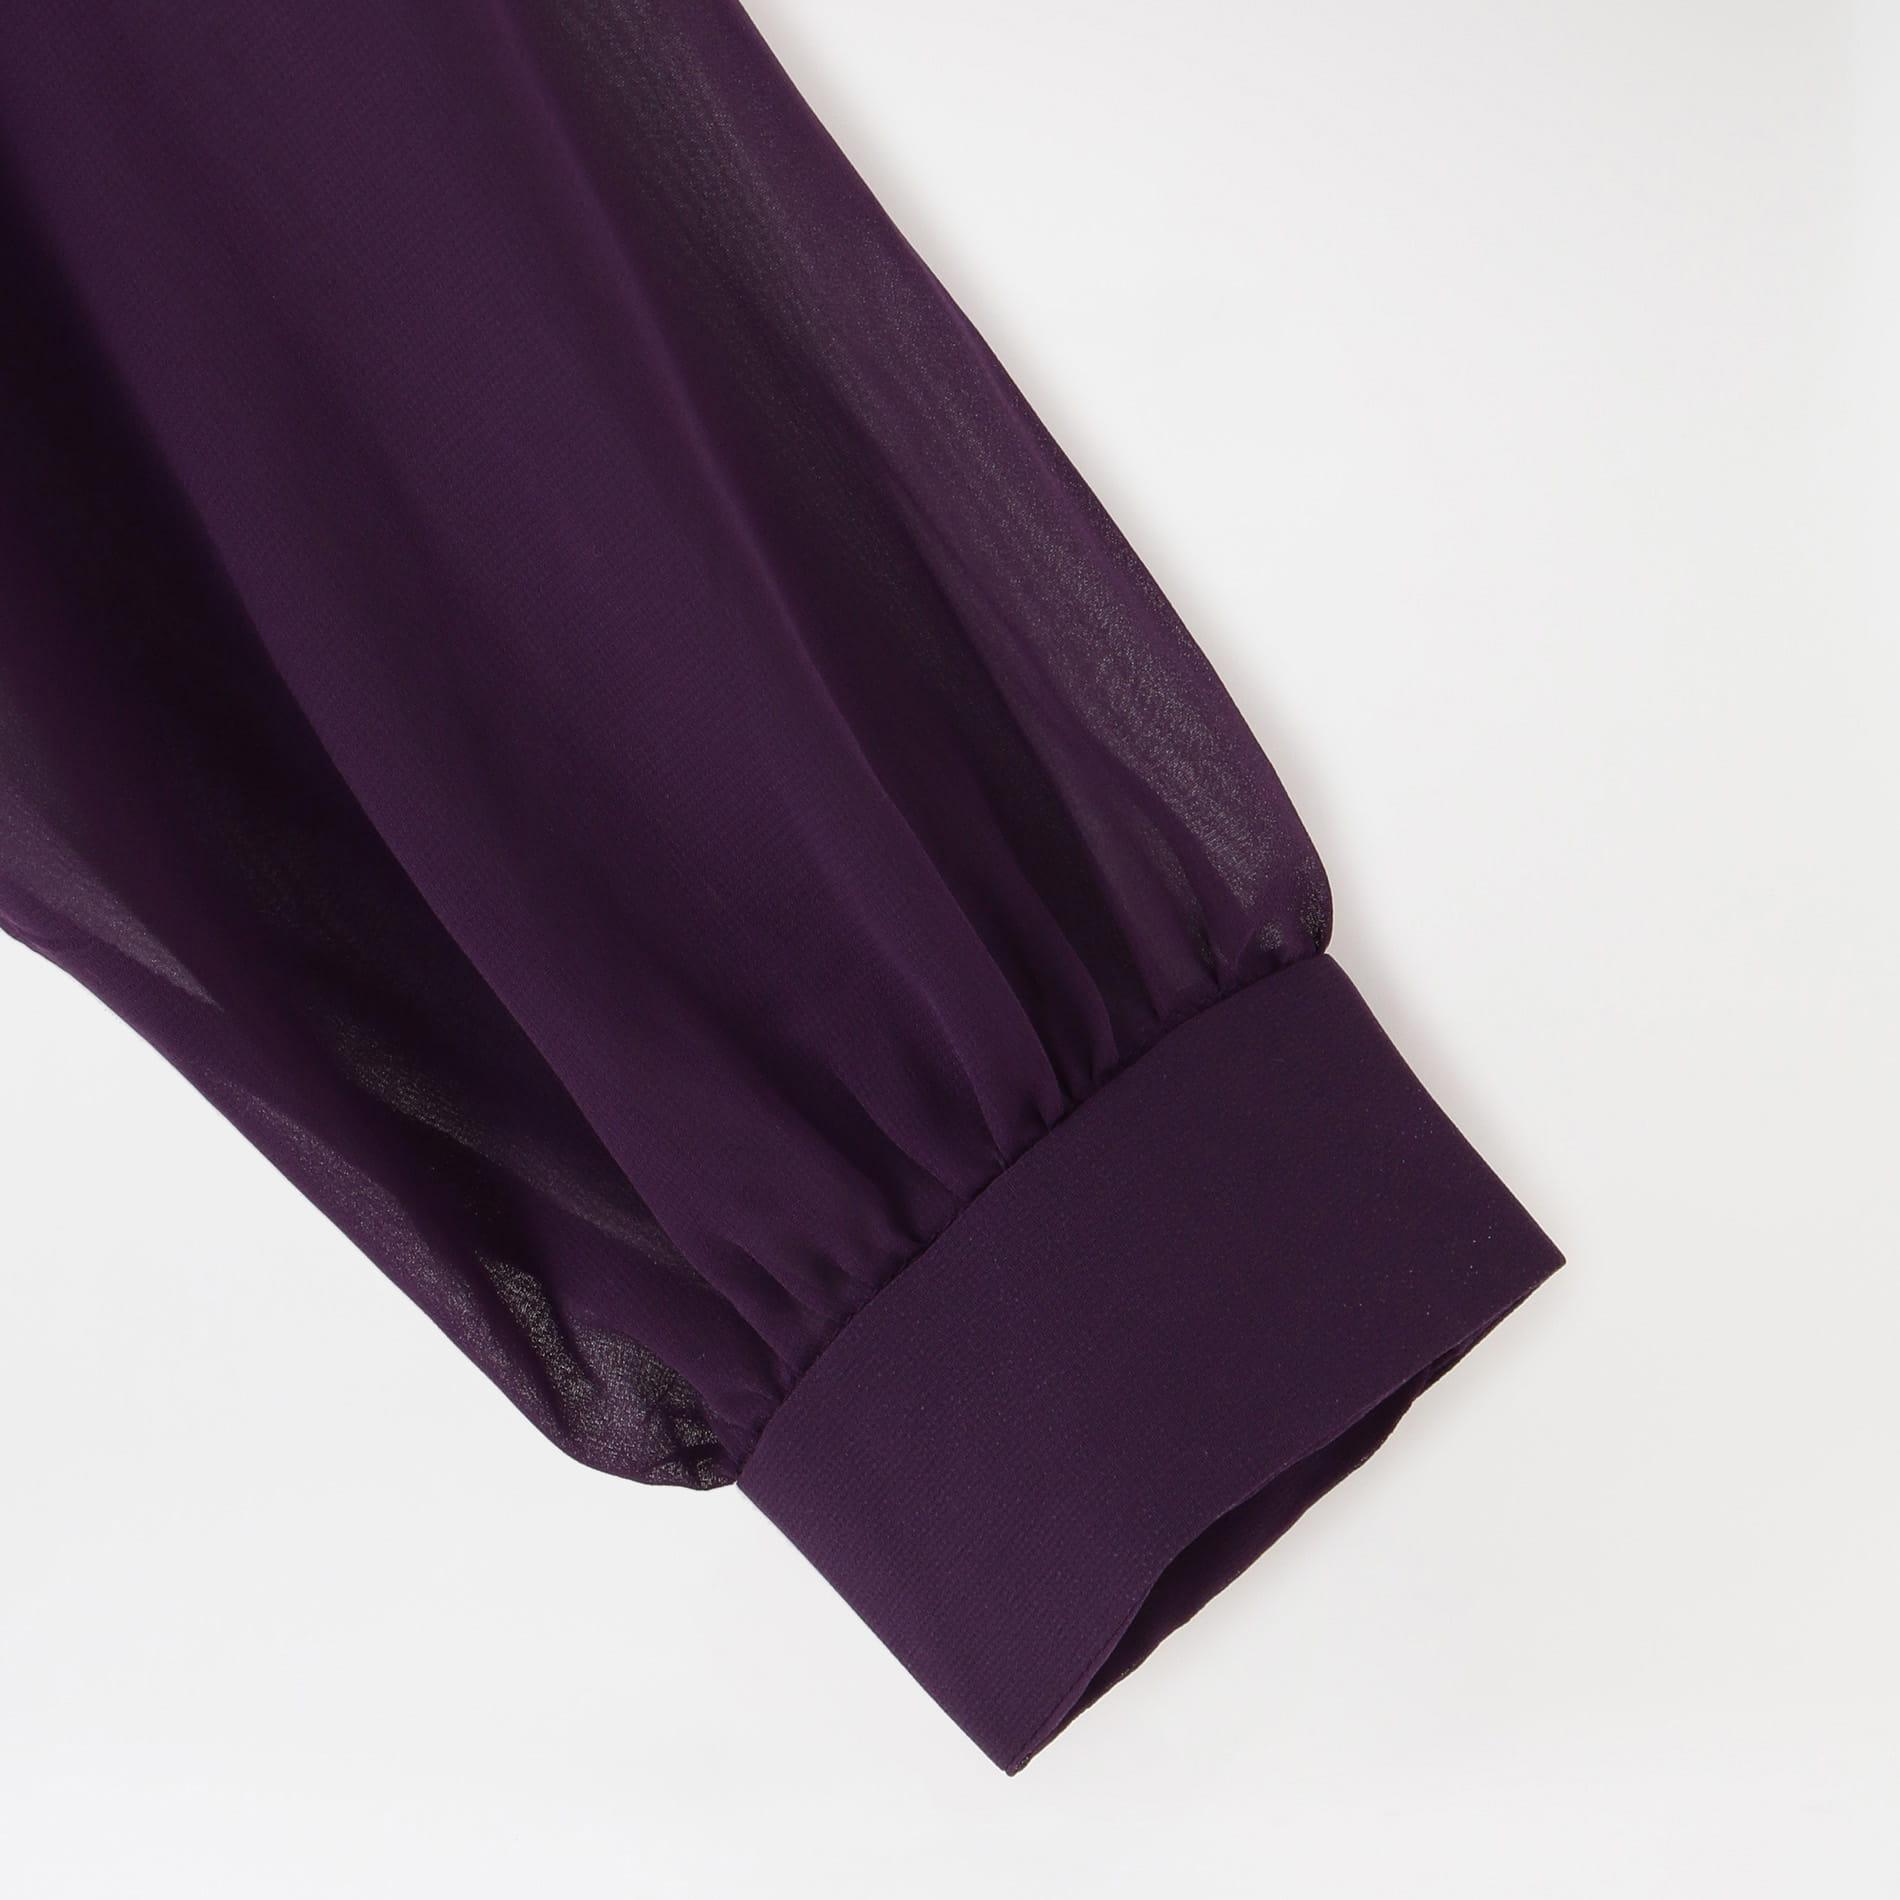 【Needles】WOMEN シャツ Gathered Blouse - Poly Chiffon IN139